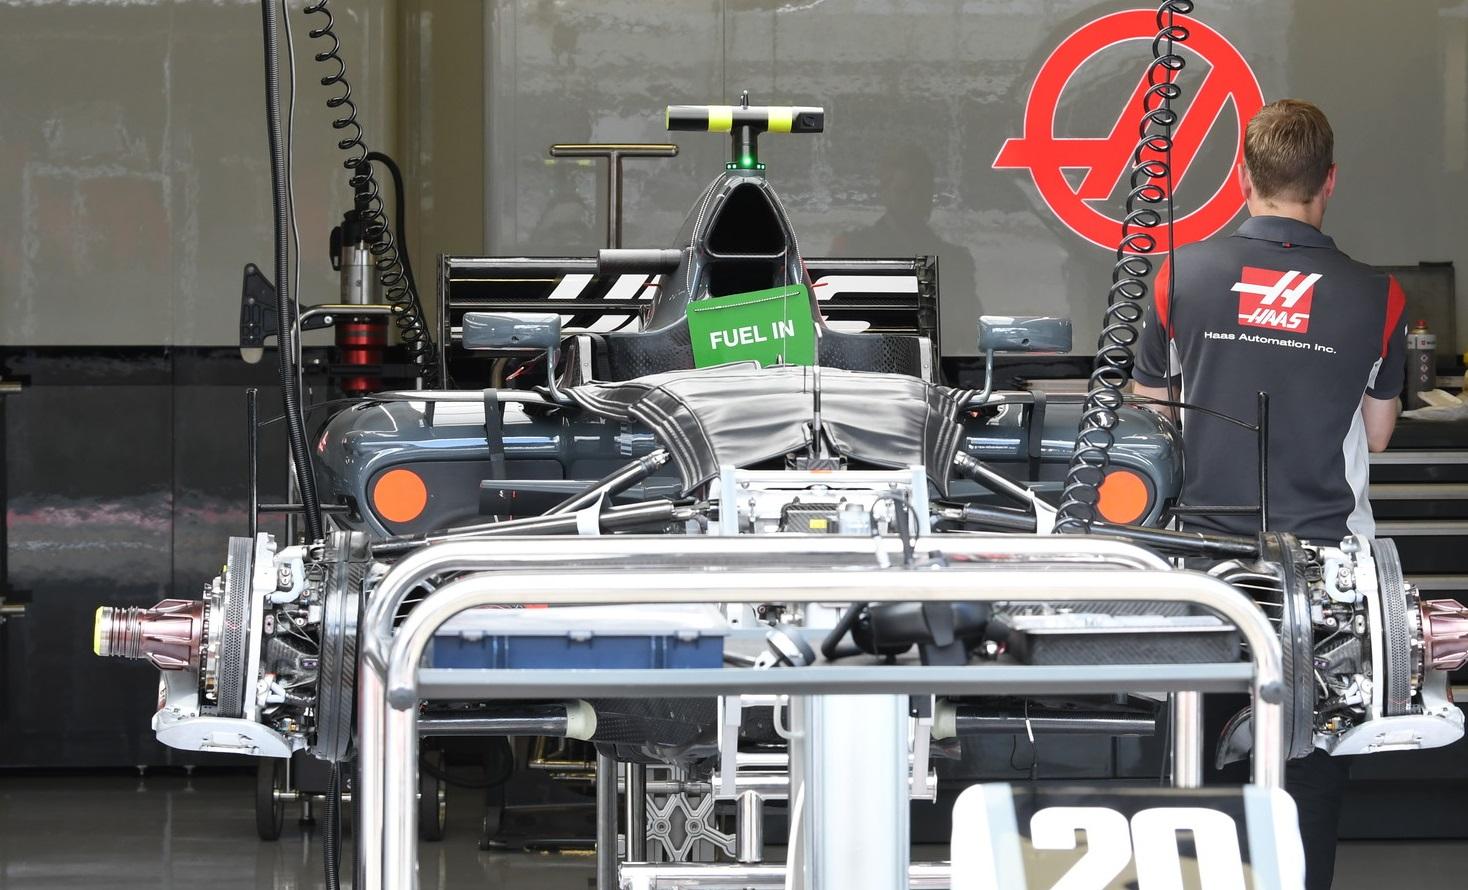 Fuel in, üzemanyag, karbonsemleges üzemanyagrendszer